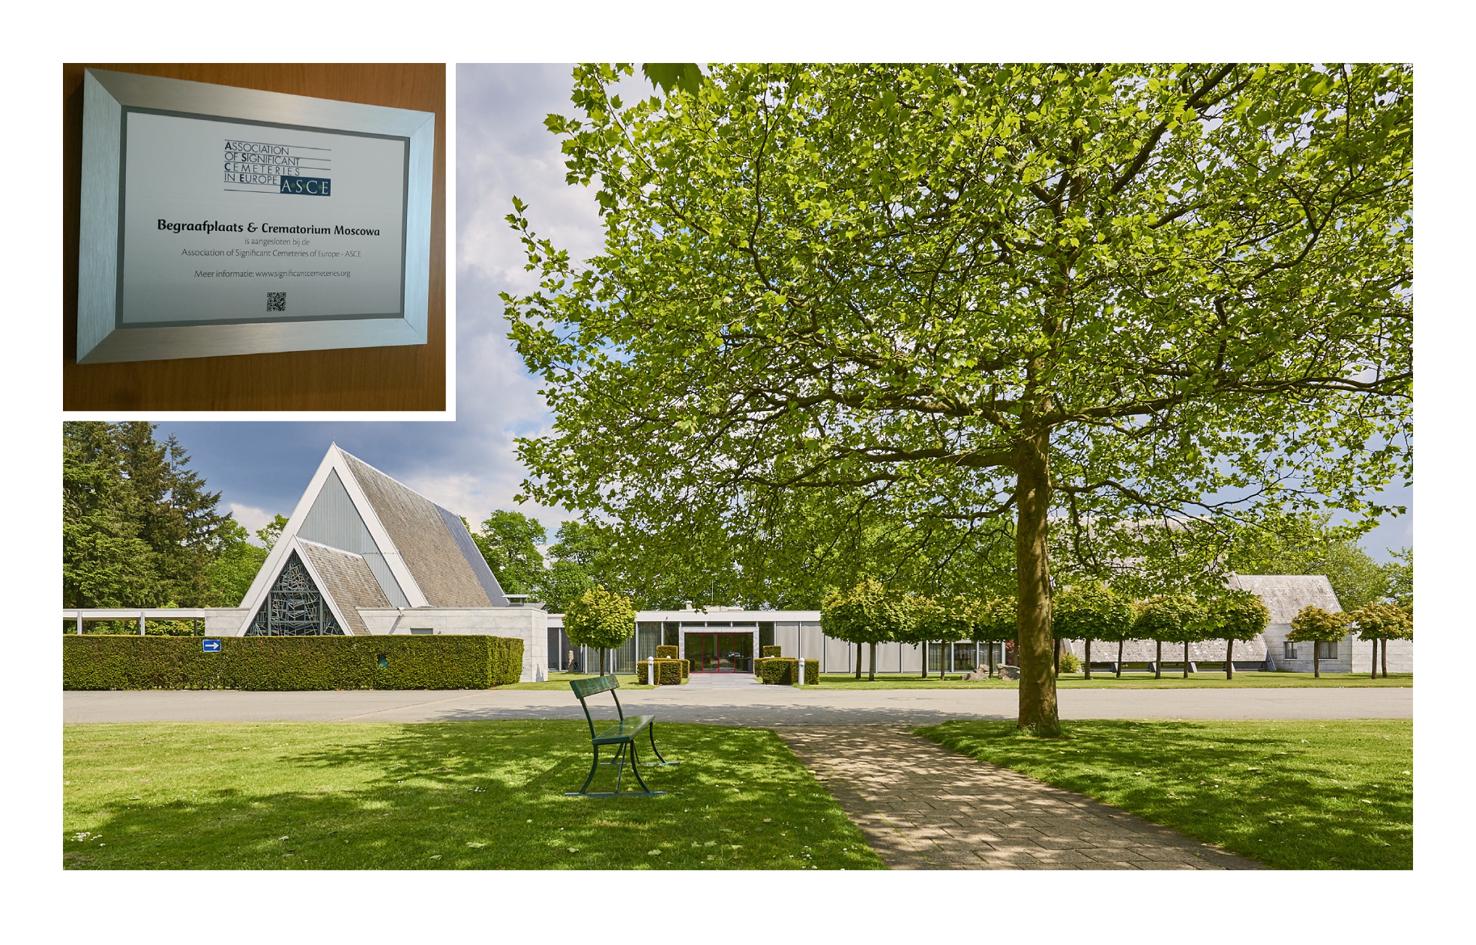 Moscowa Cemetery & Crematorium (Arnhem, Netherlans)